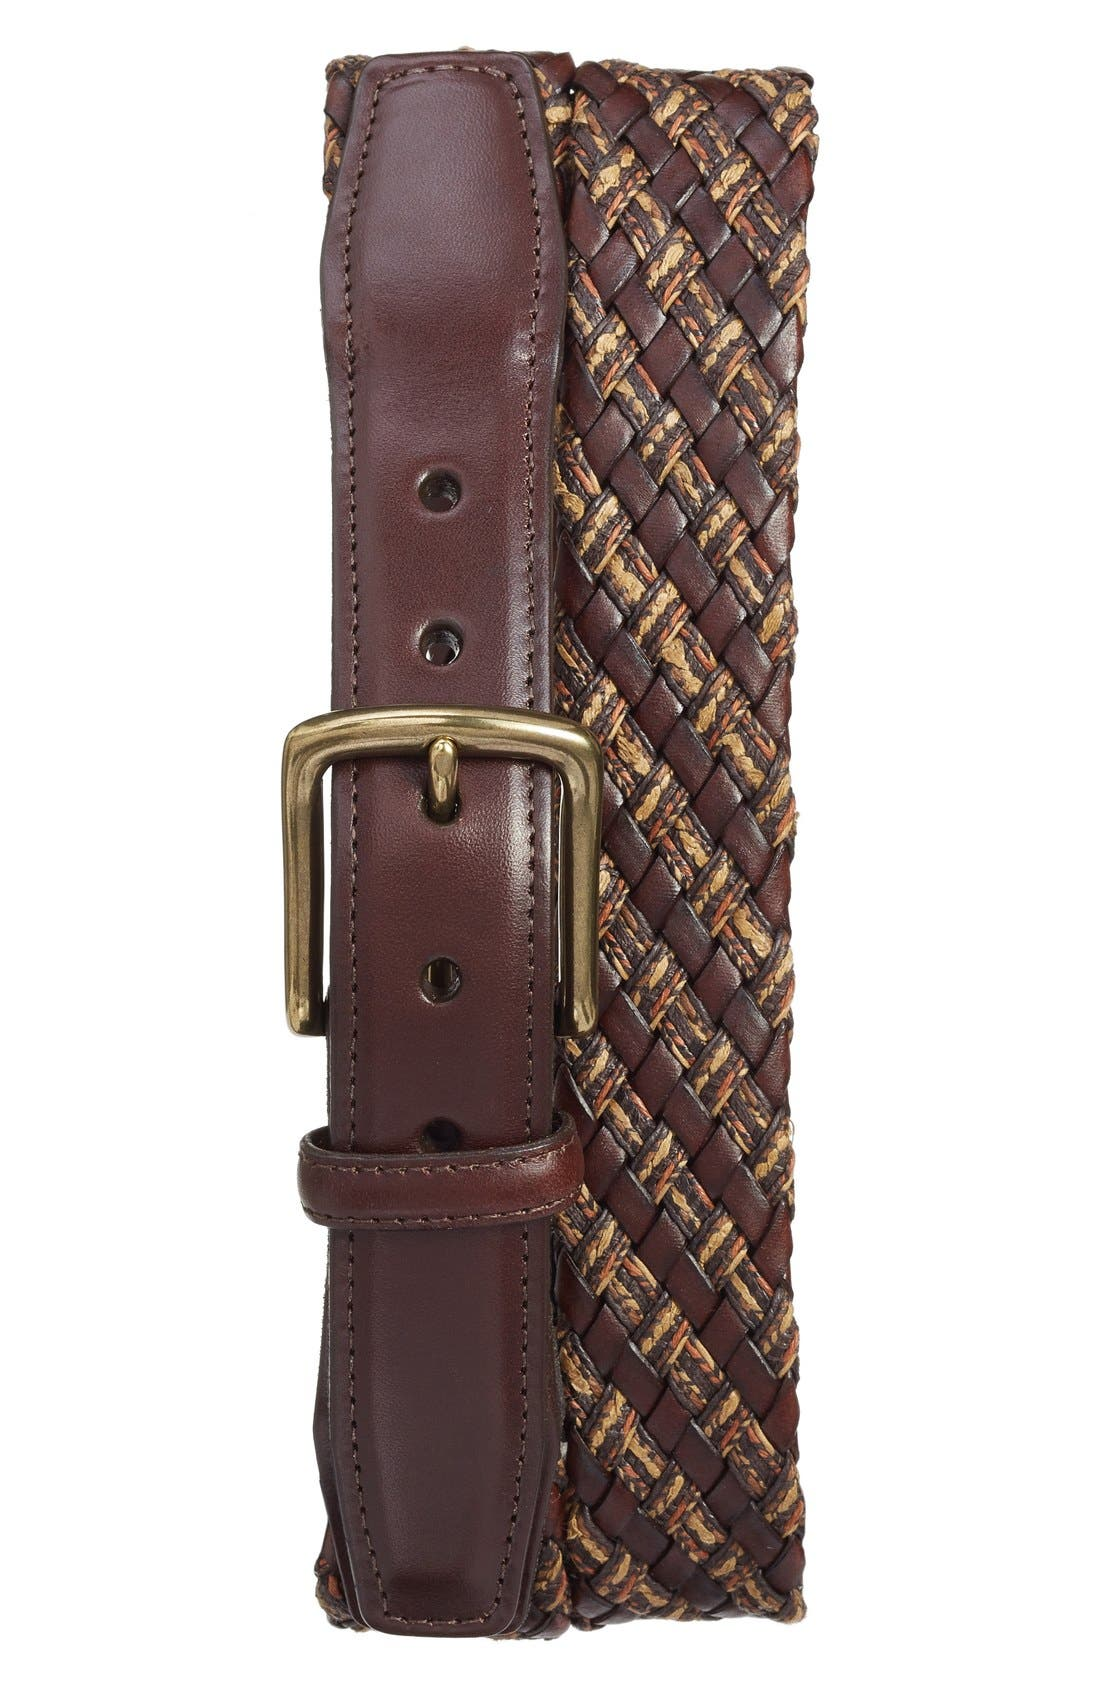 Alternate Image 1 Selected - Torino Belts Woven & Leather Belt